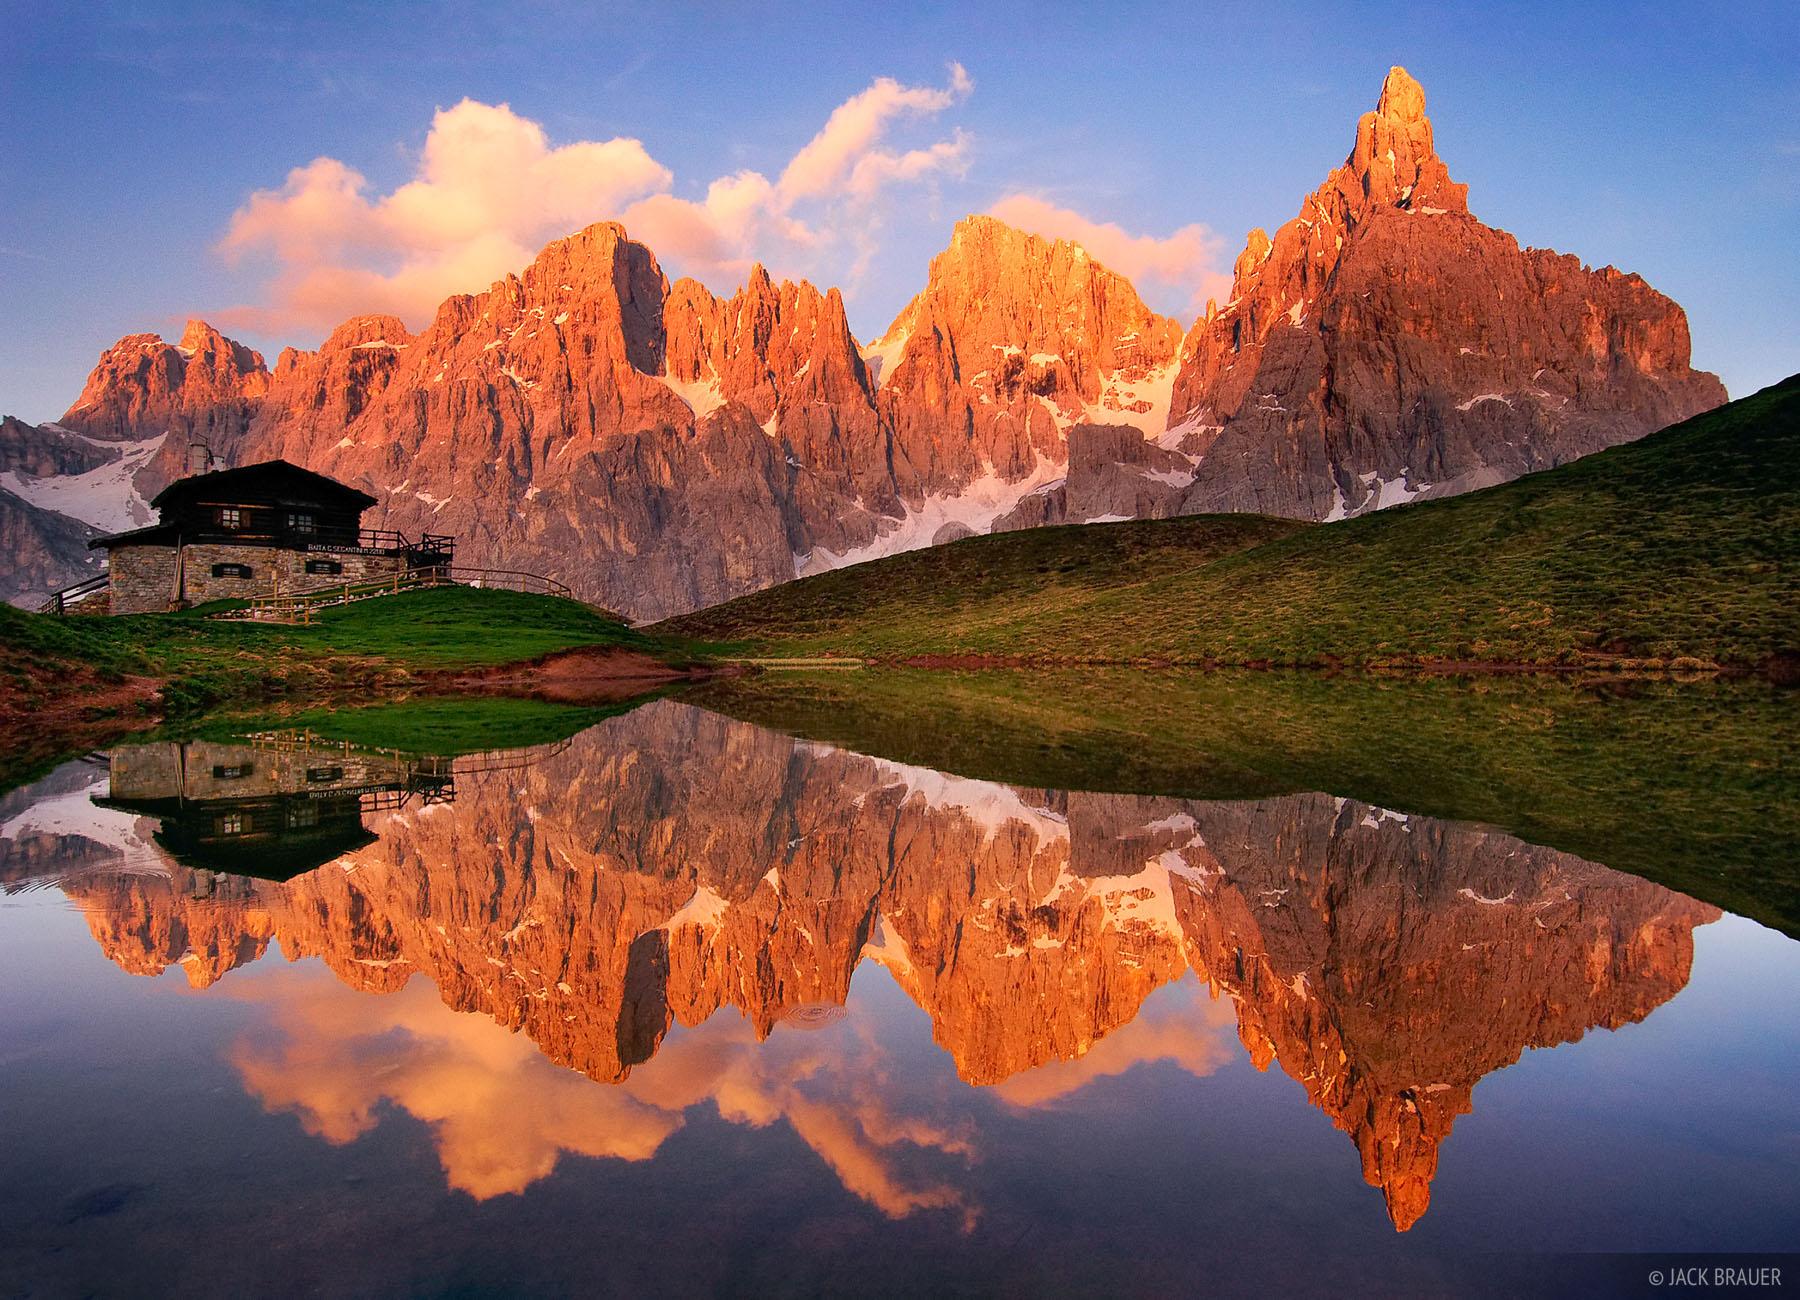 Baita Segantini, reflection, San Martino, Dolomites, Italy, photo